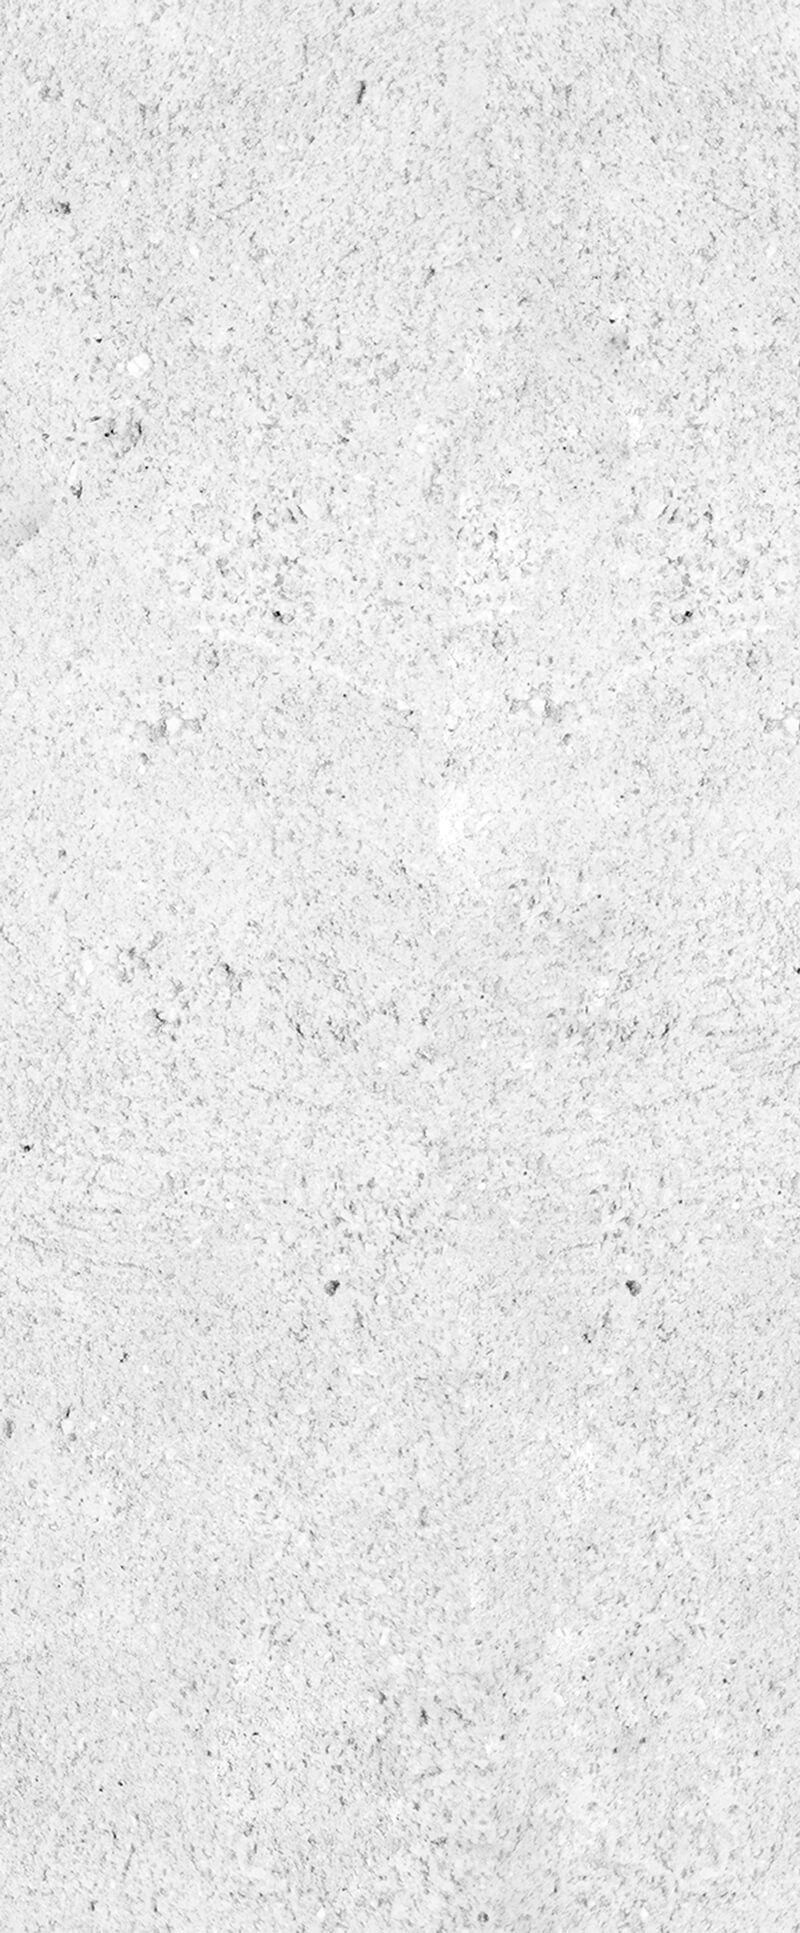 concrete_texture_vert